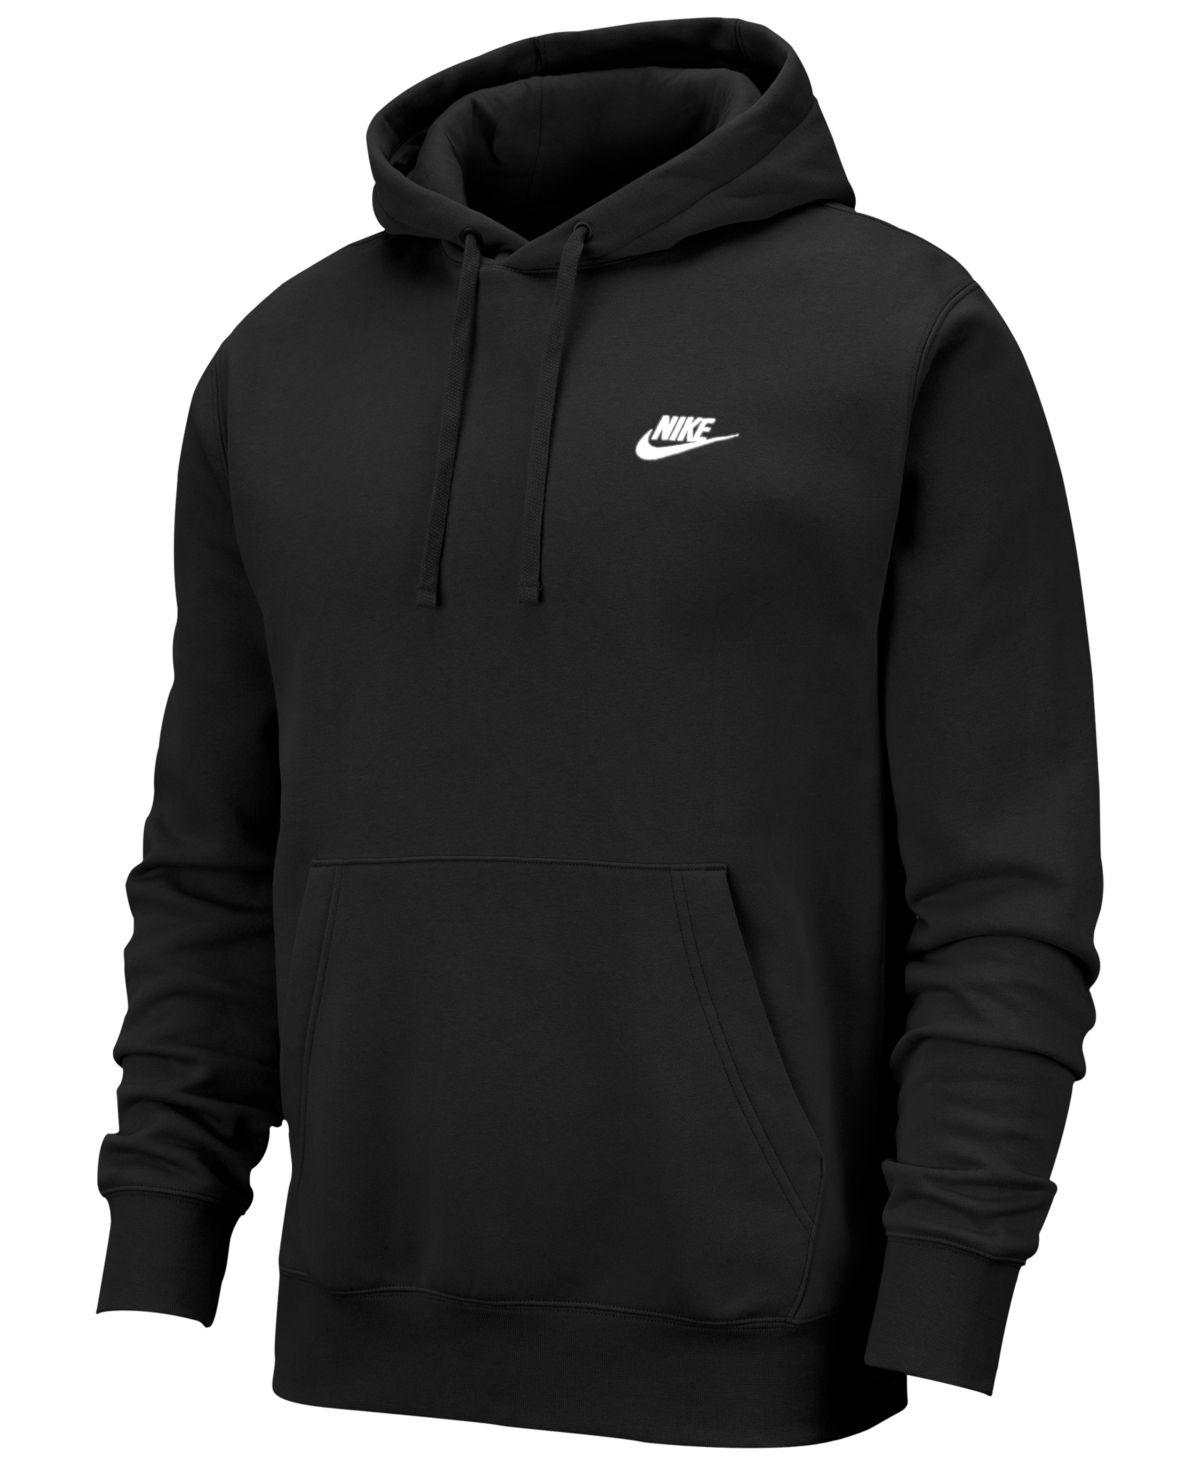 Plain BLACK Cotton Rich Hoody Hoodie Hooded Sweat No Logo S-XXXL